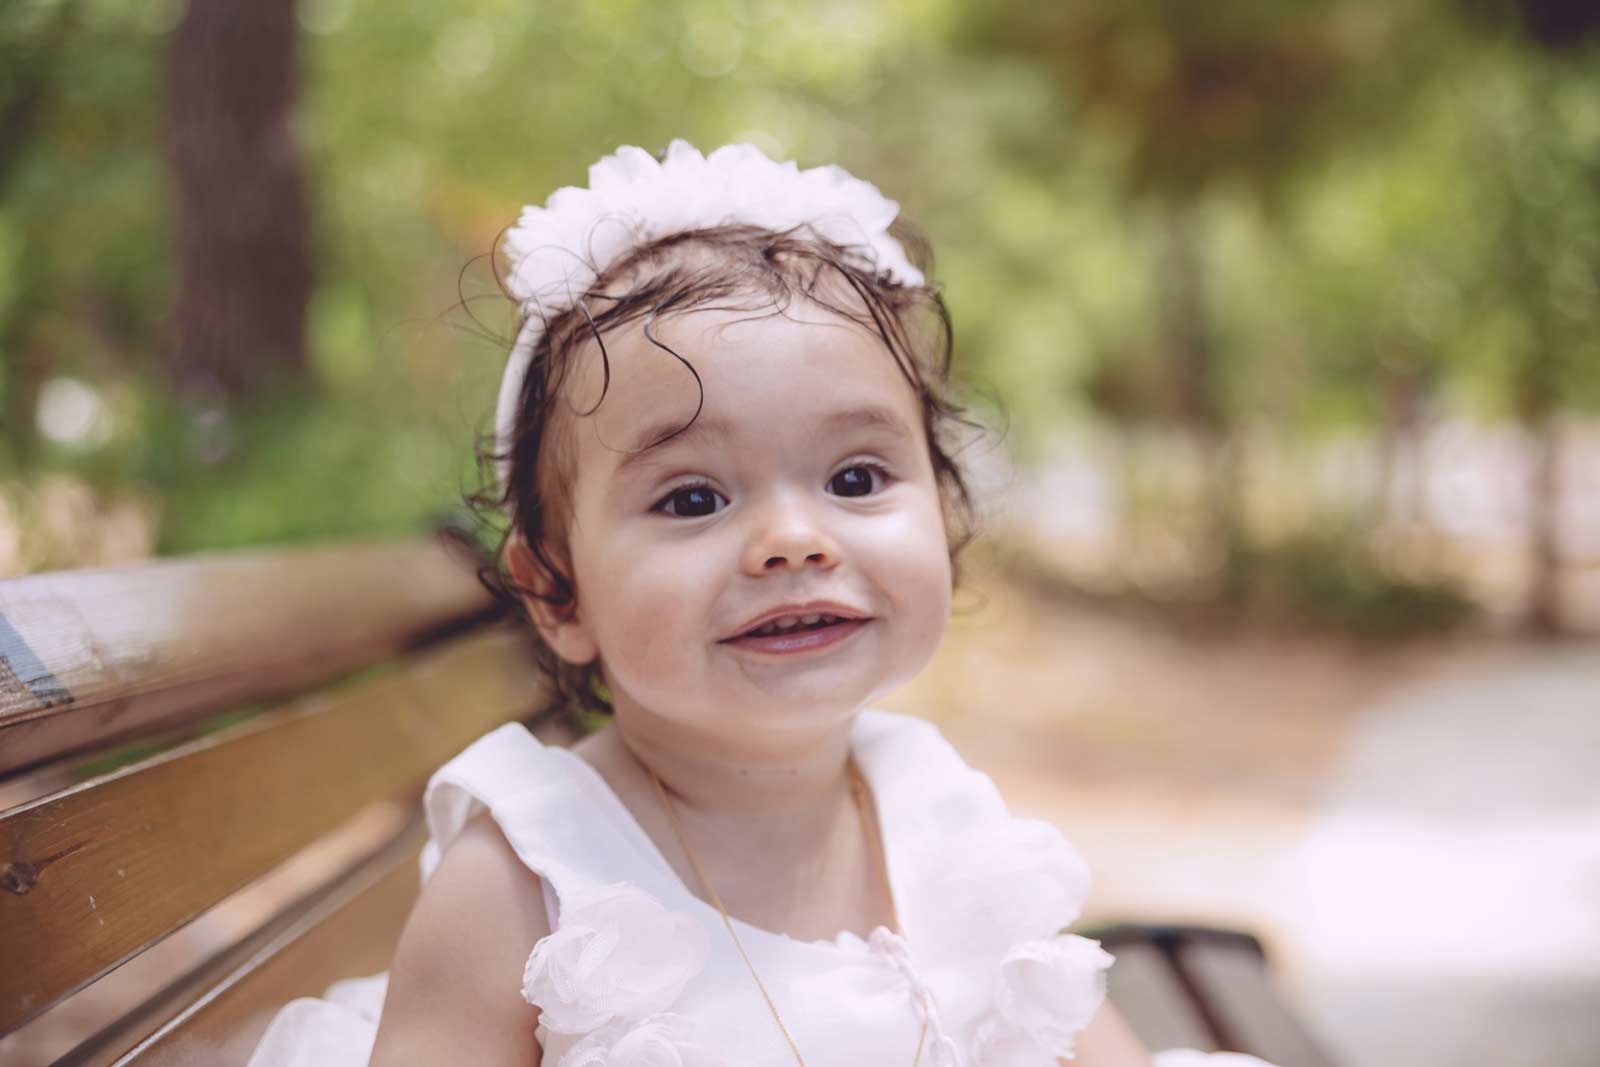 405 PhotoVaptisis βαπτιση βουλα αγιος νεκταριος vaptisi fotografos moro mama nona 016 PhotoVaptisis